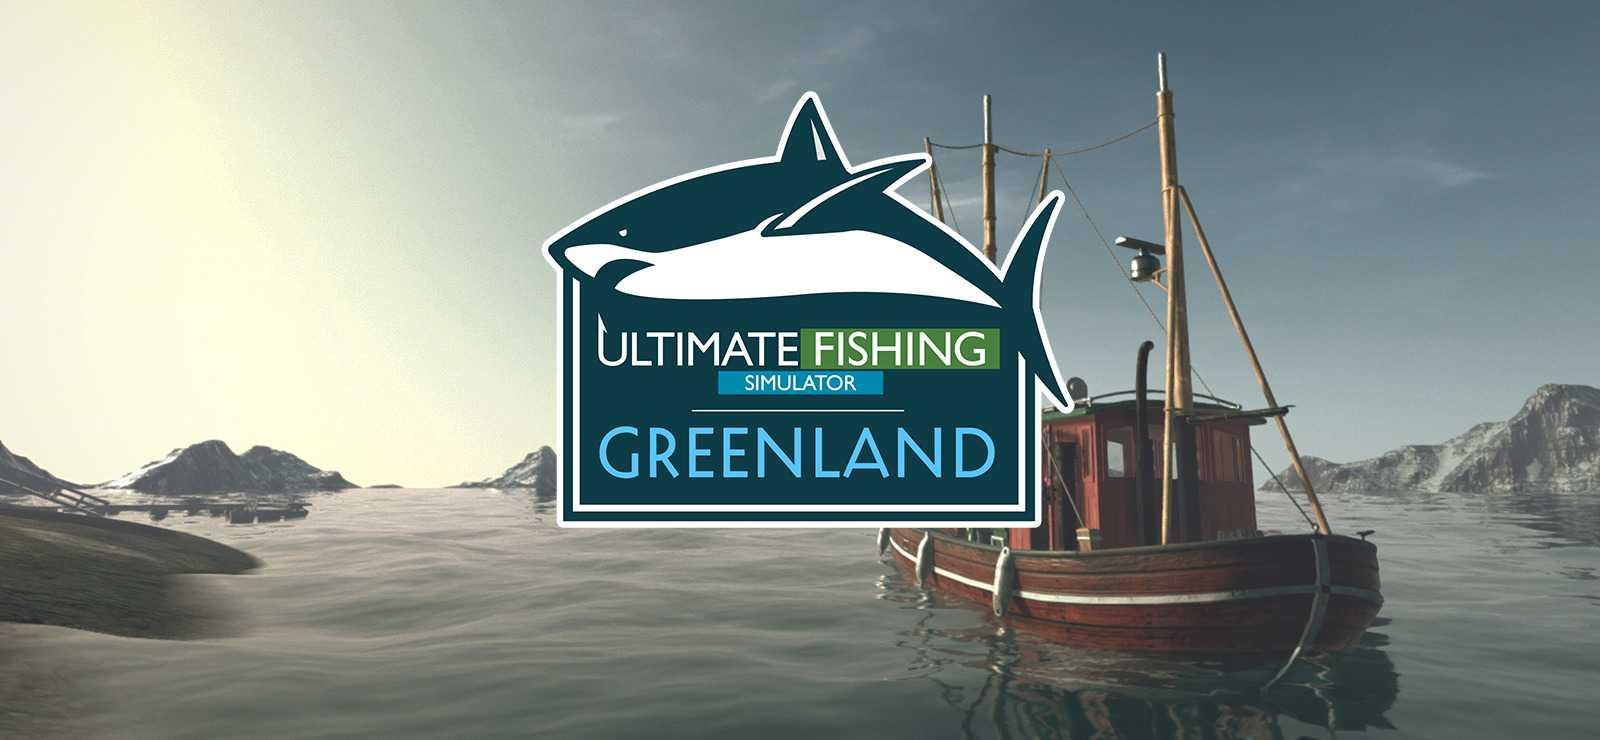 Ultimate Fishing Simulator - Greenland DLC